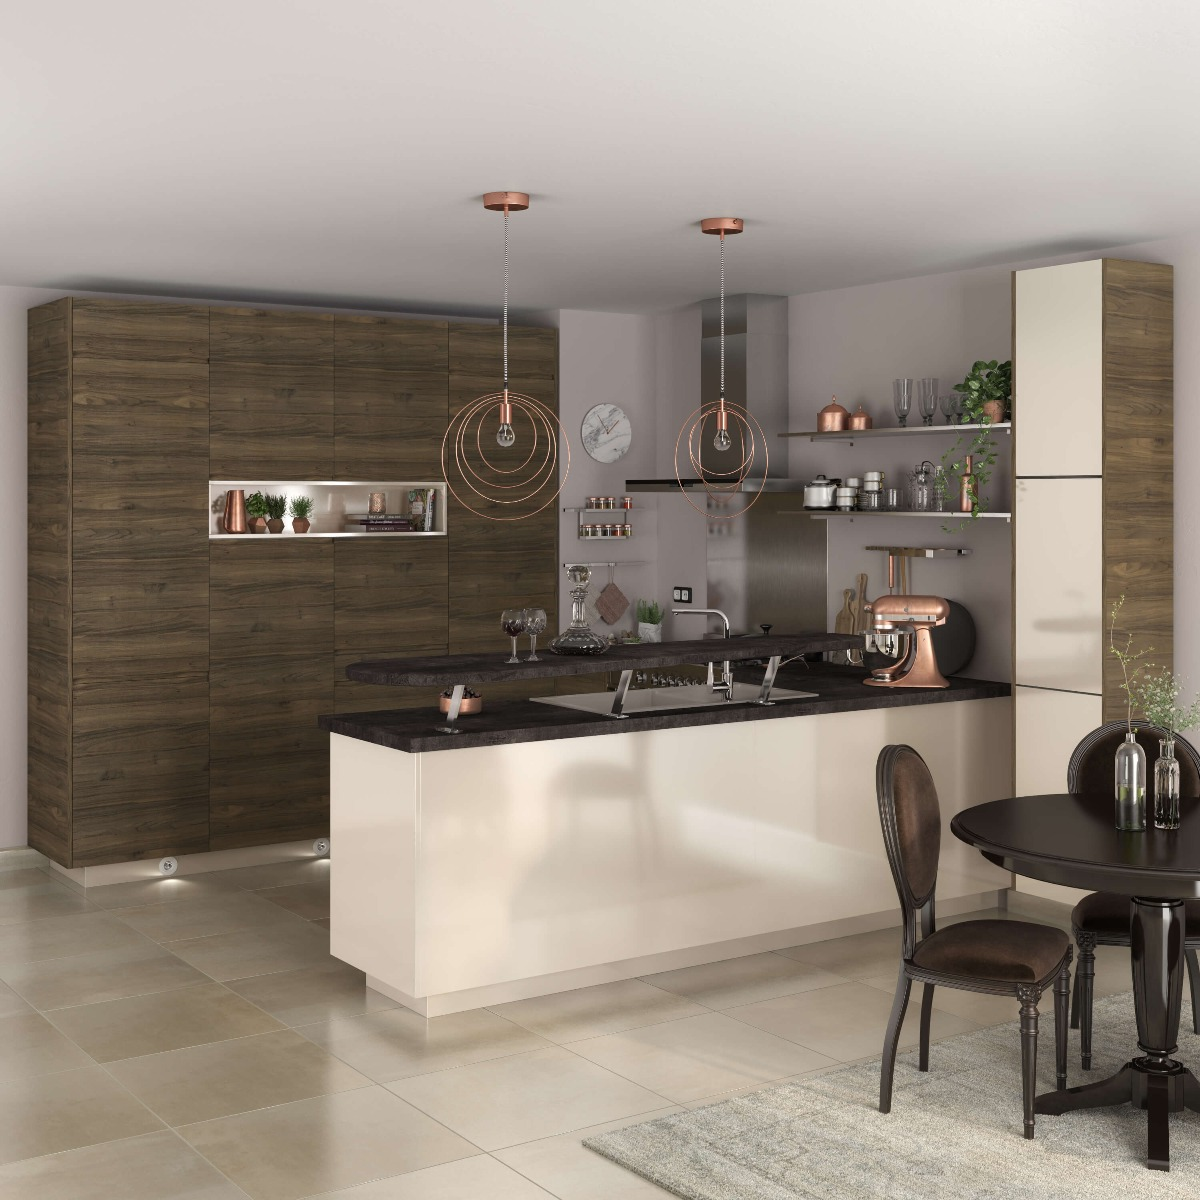 Delinia Sevilla Ivory Designer Kitchen Mobi - Example 3